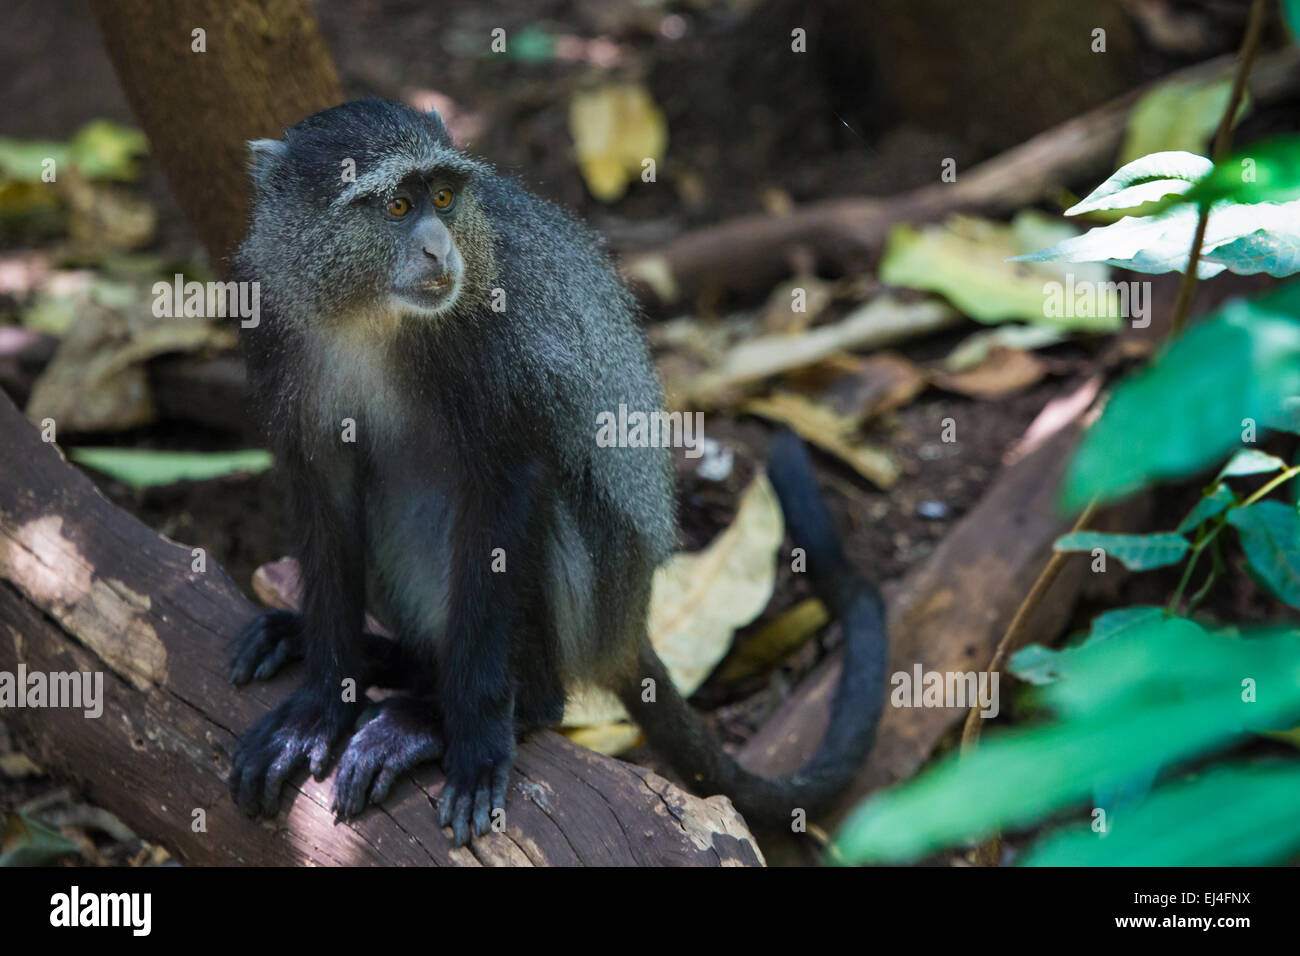 Portrait of a Blue Monkey face in Lake Manyara National Park, Tanzania - Stock Image